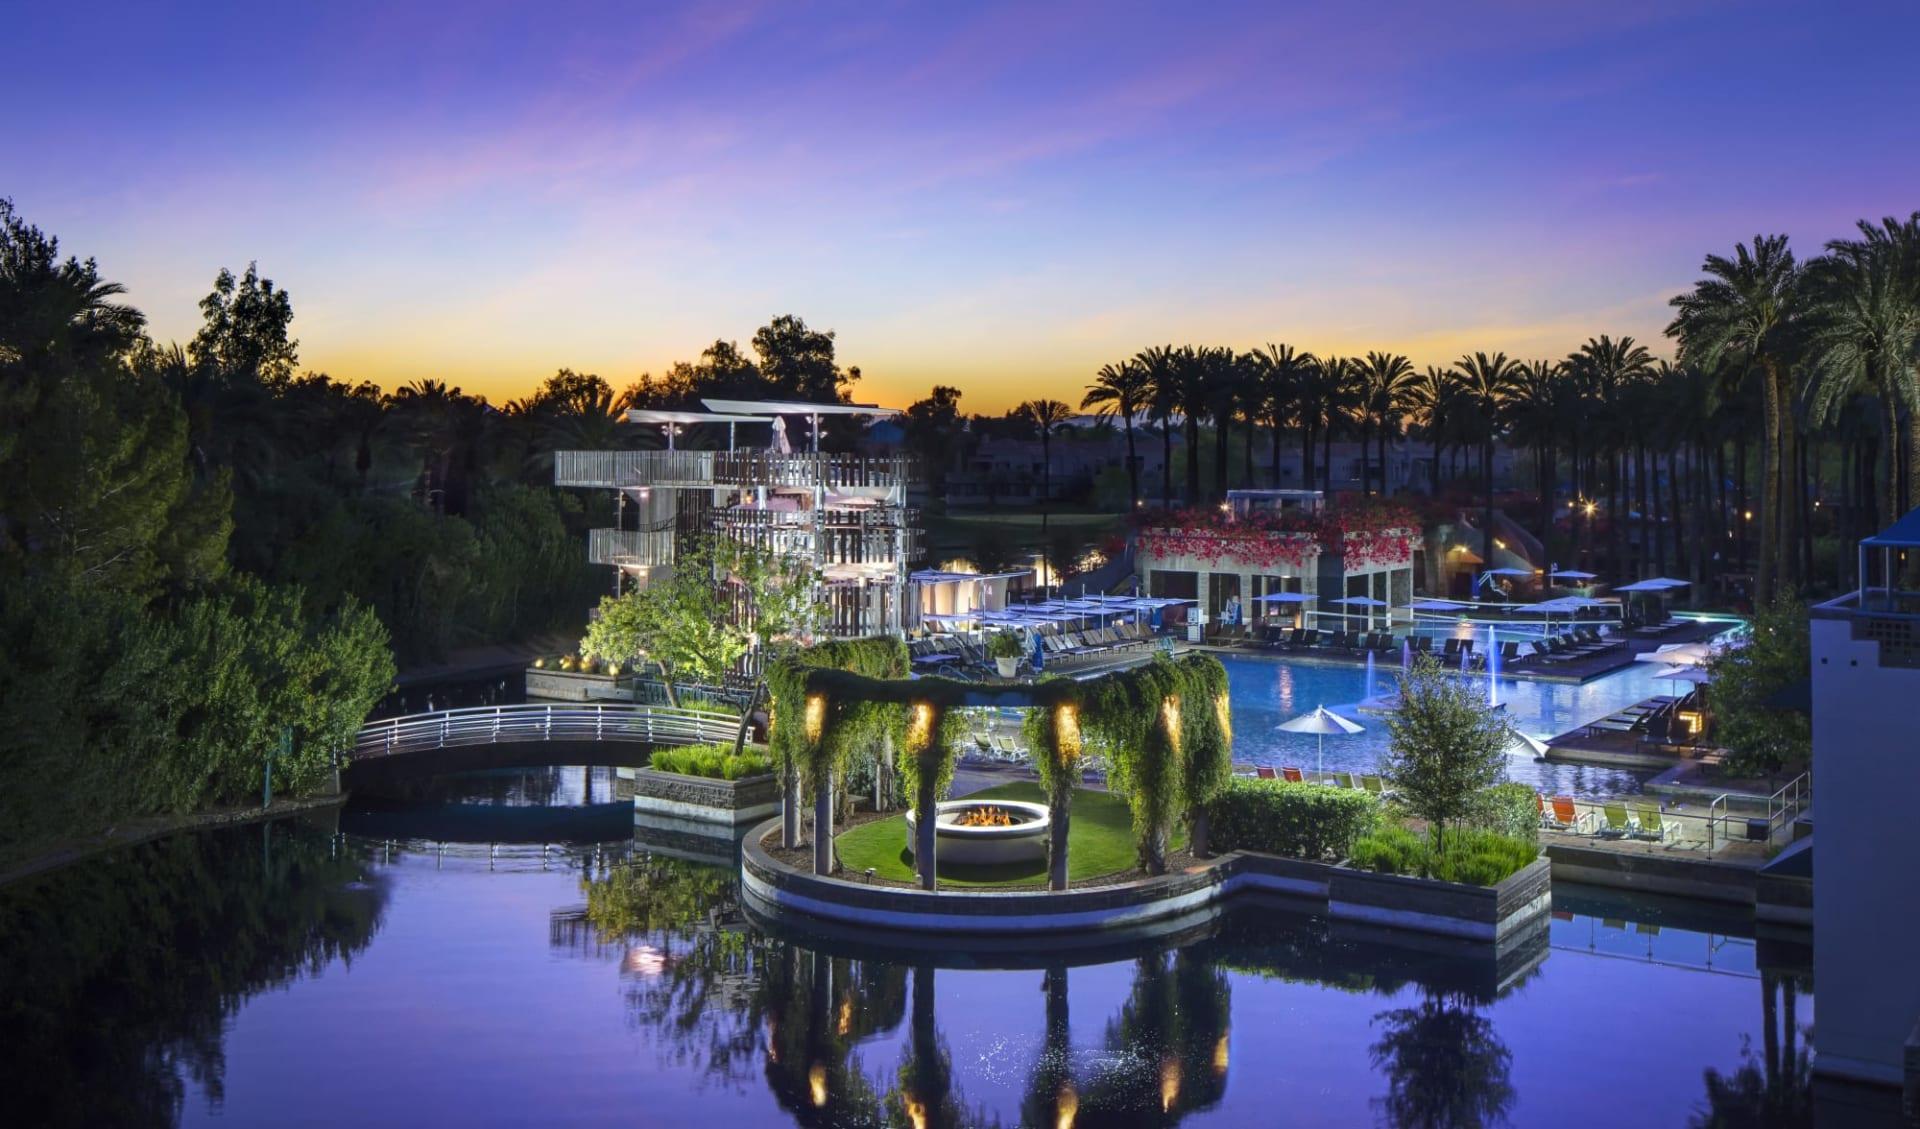 Hyatt Regency Resort Scottsdale:  Hyatt Regency Scottsdale Resort & Spa at Gainey Ranch - Night Beach Colonnade